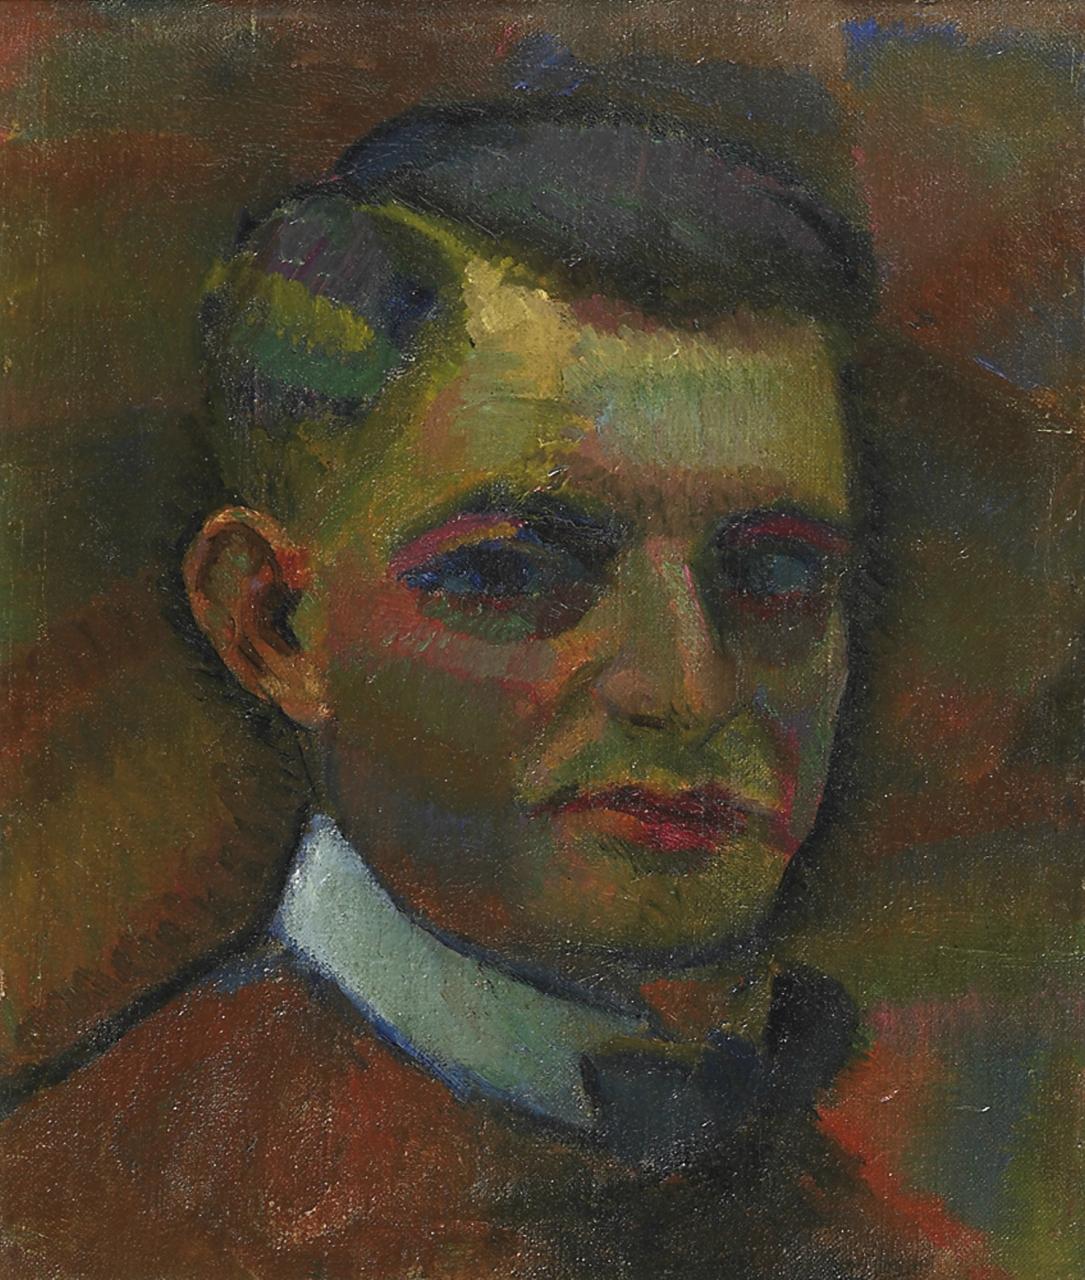 Baranoff-Rossine, Vladimir Davidovich (1888-1944)